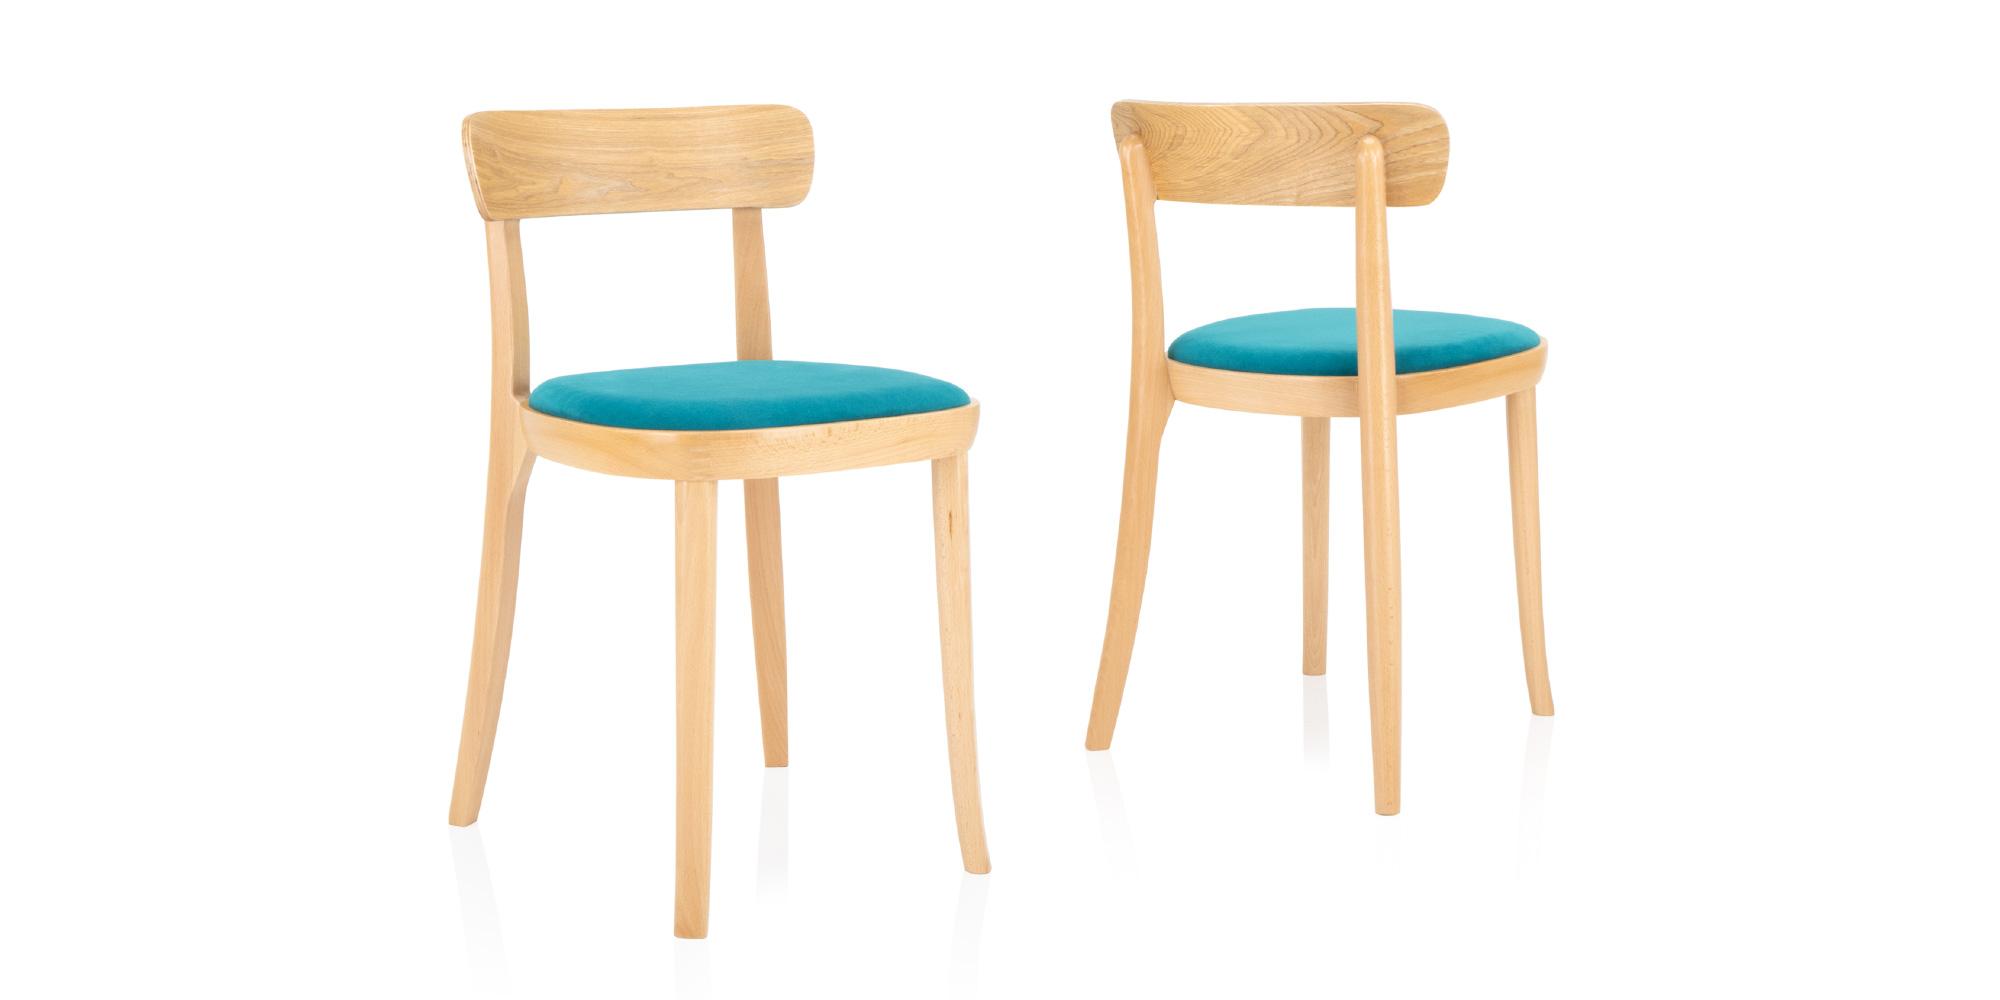 Aura Multi-Purpose Chair Feature Image